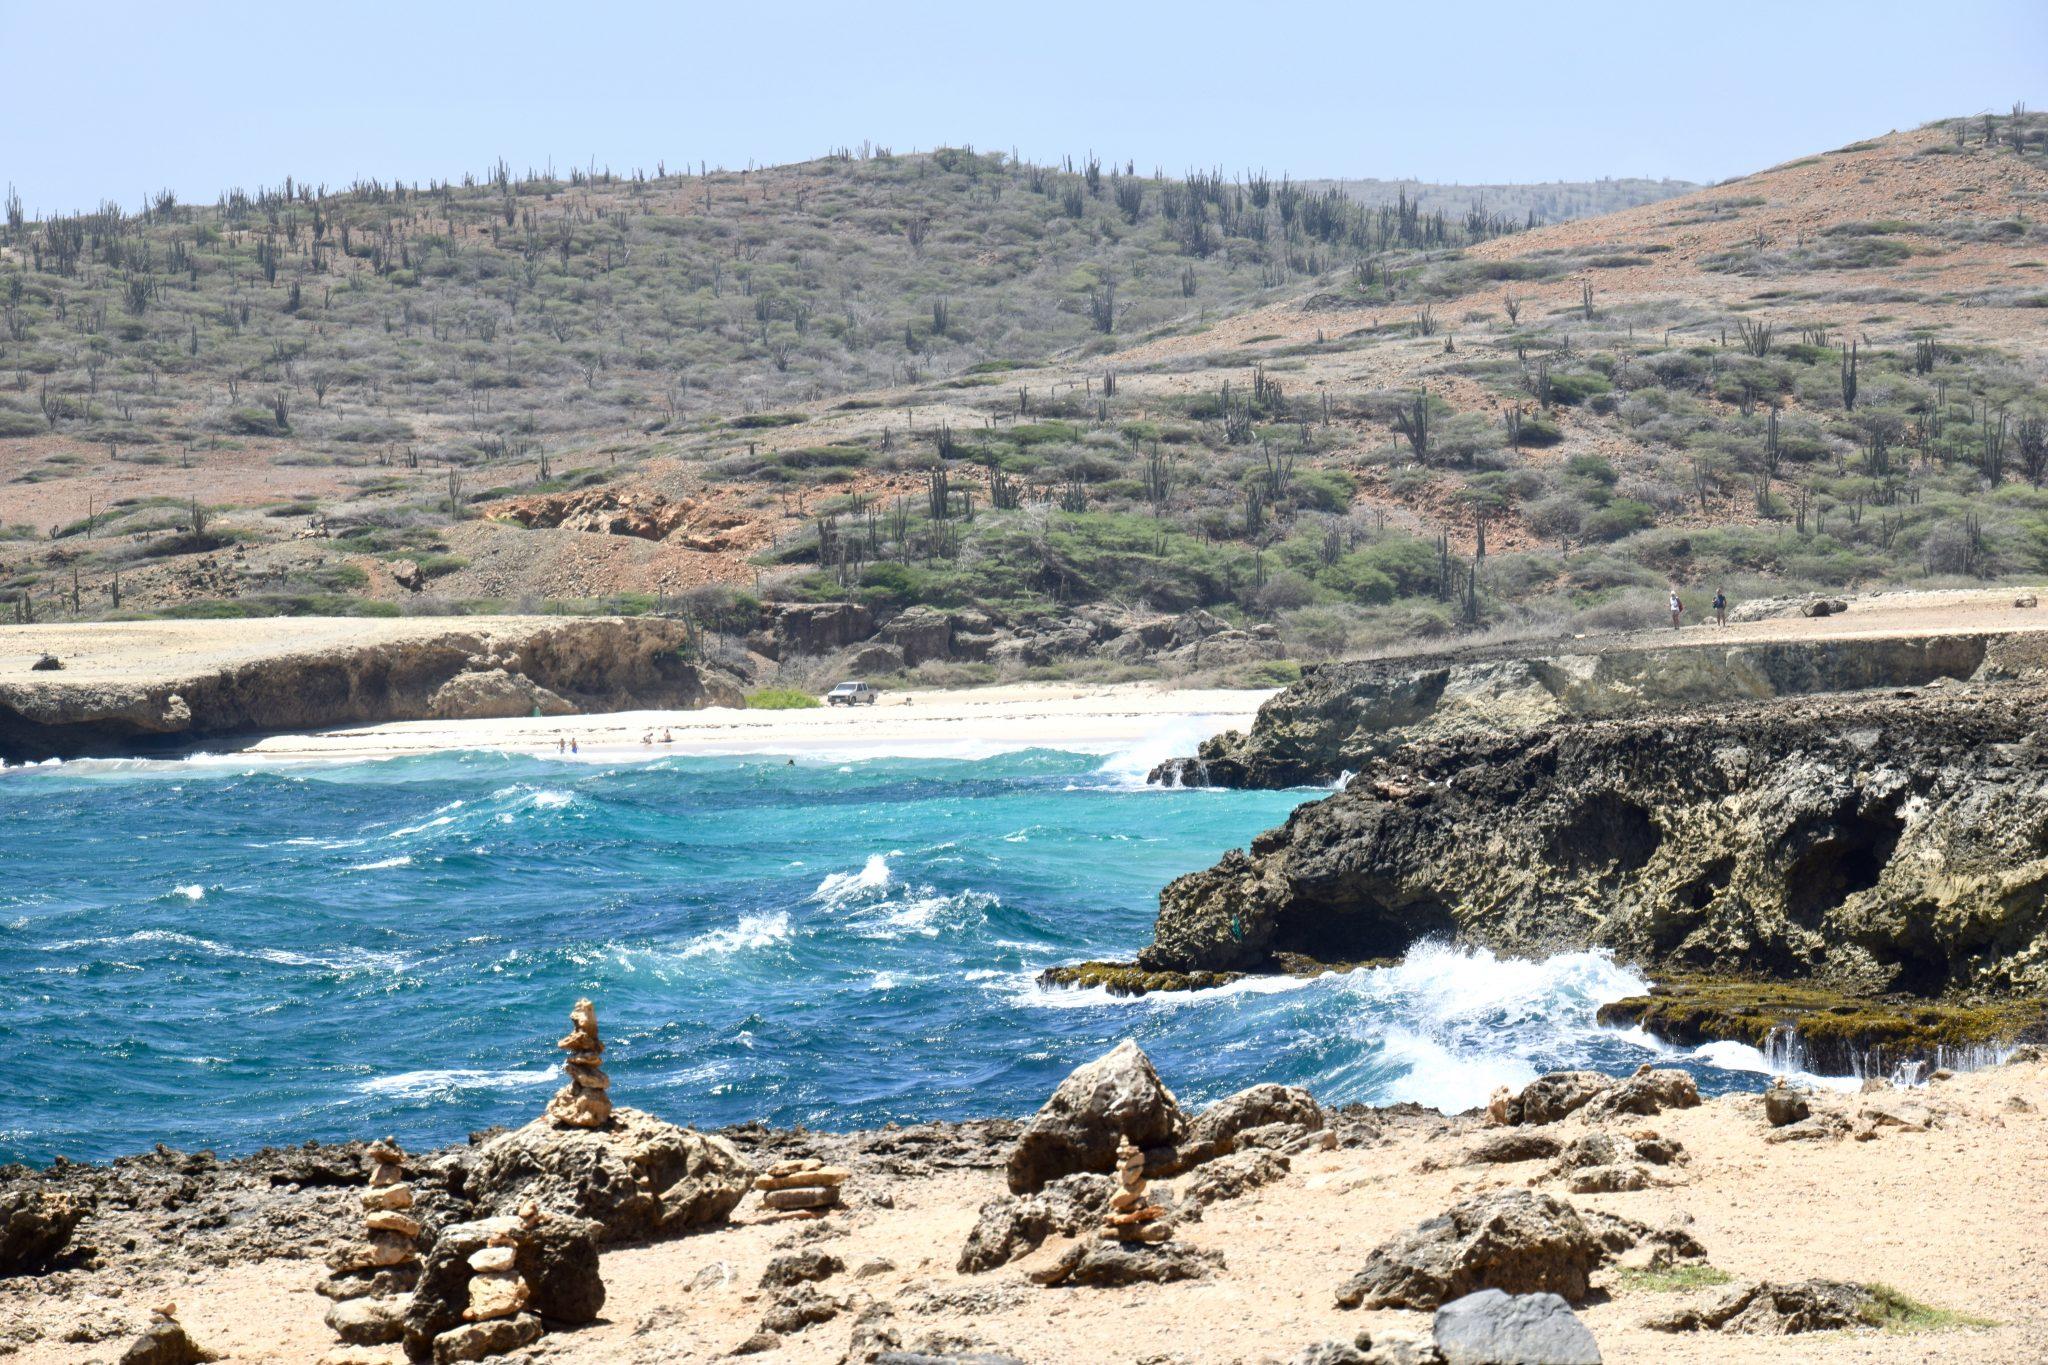 coastline of Aruba's north side